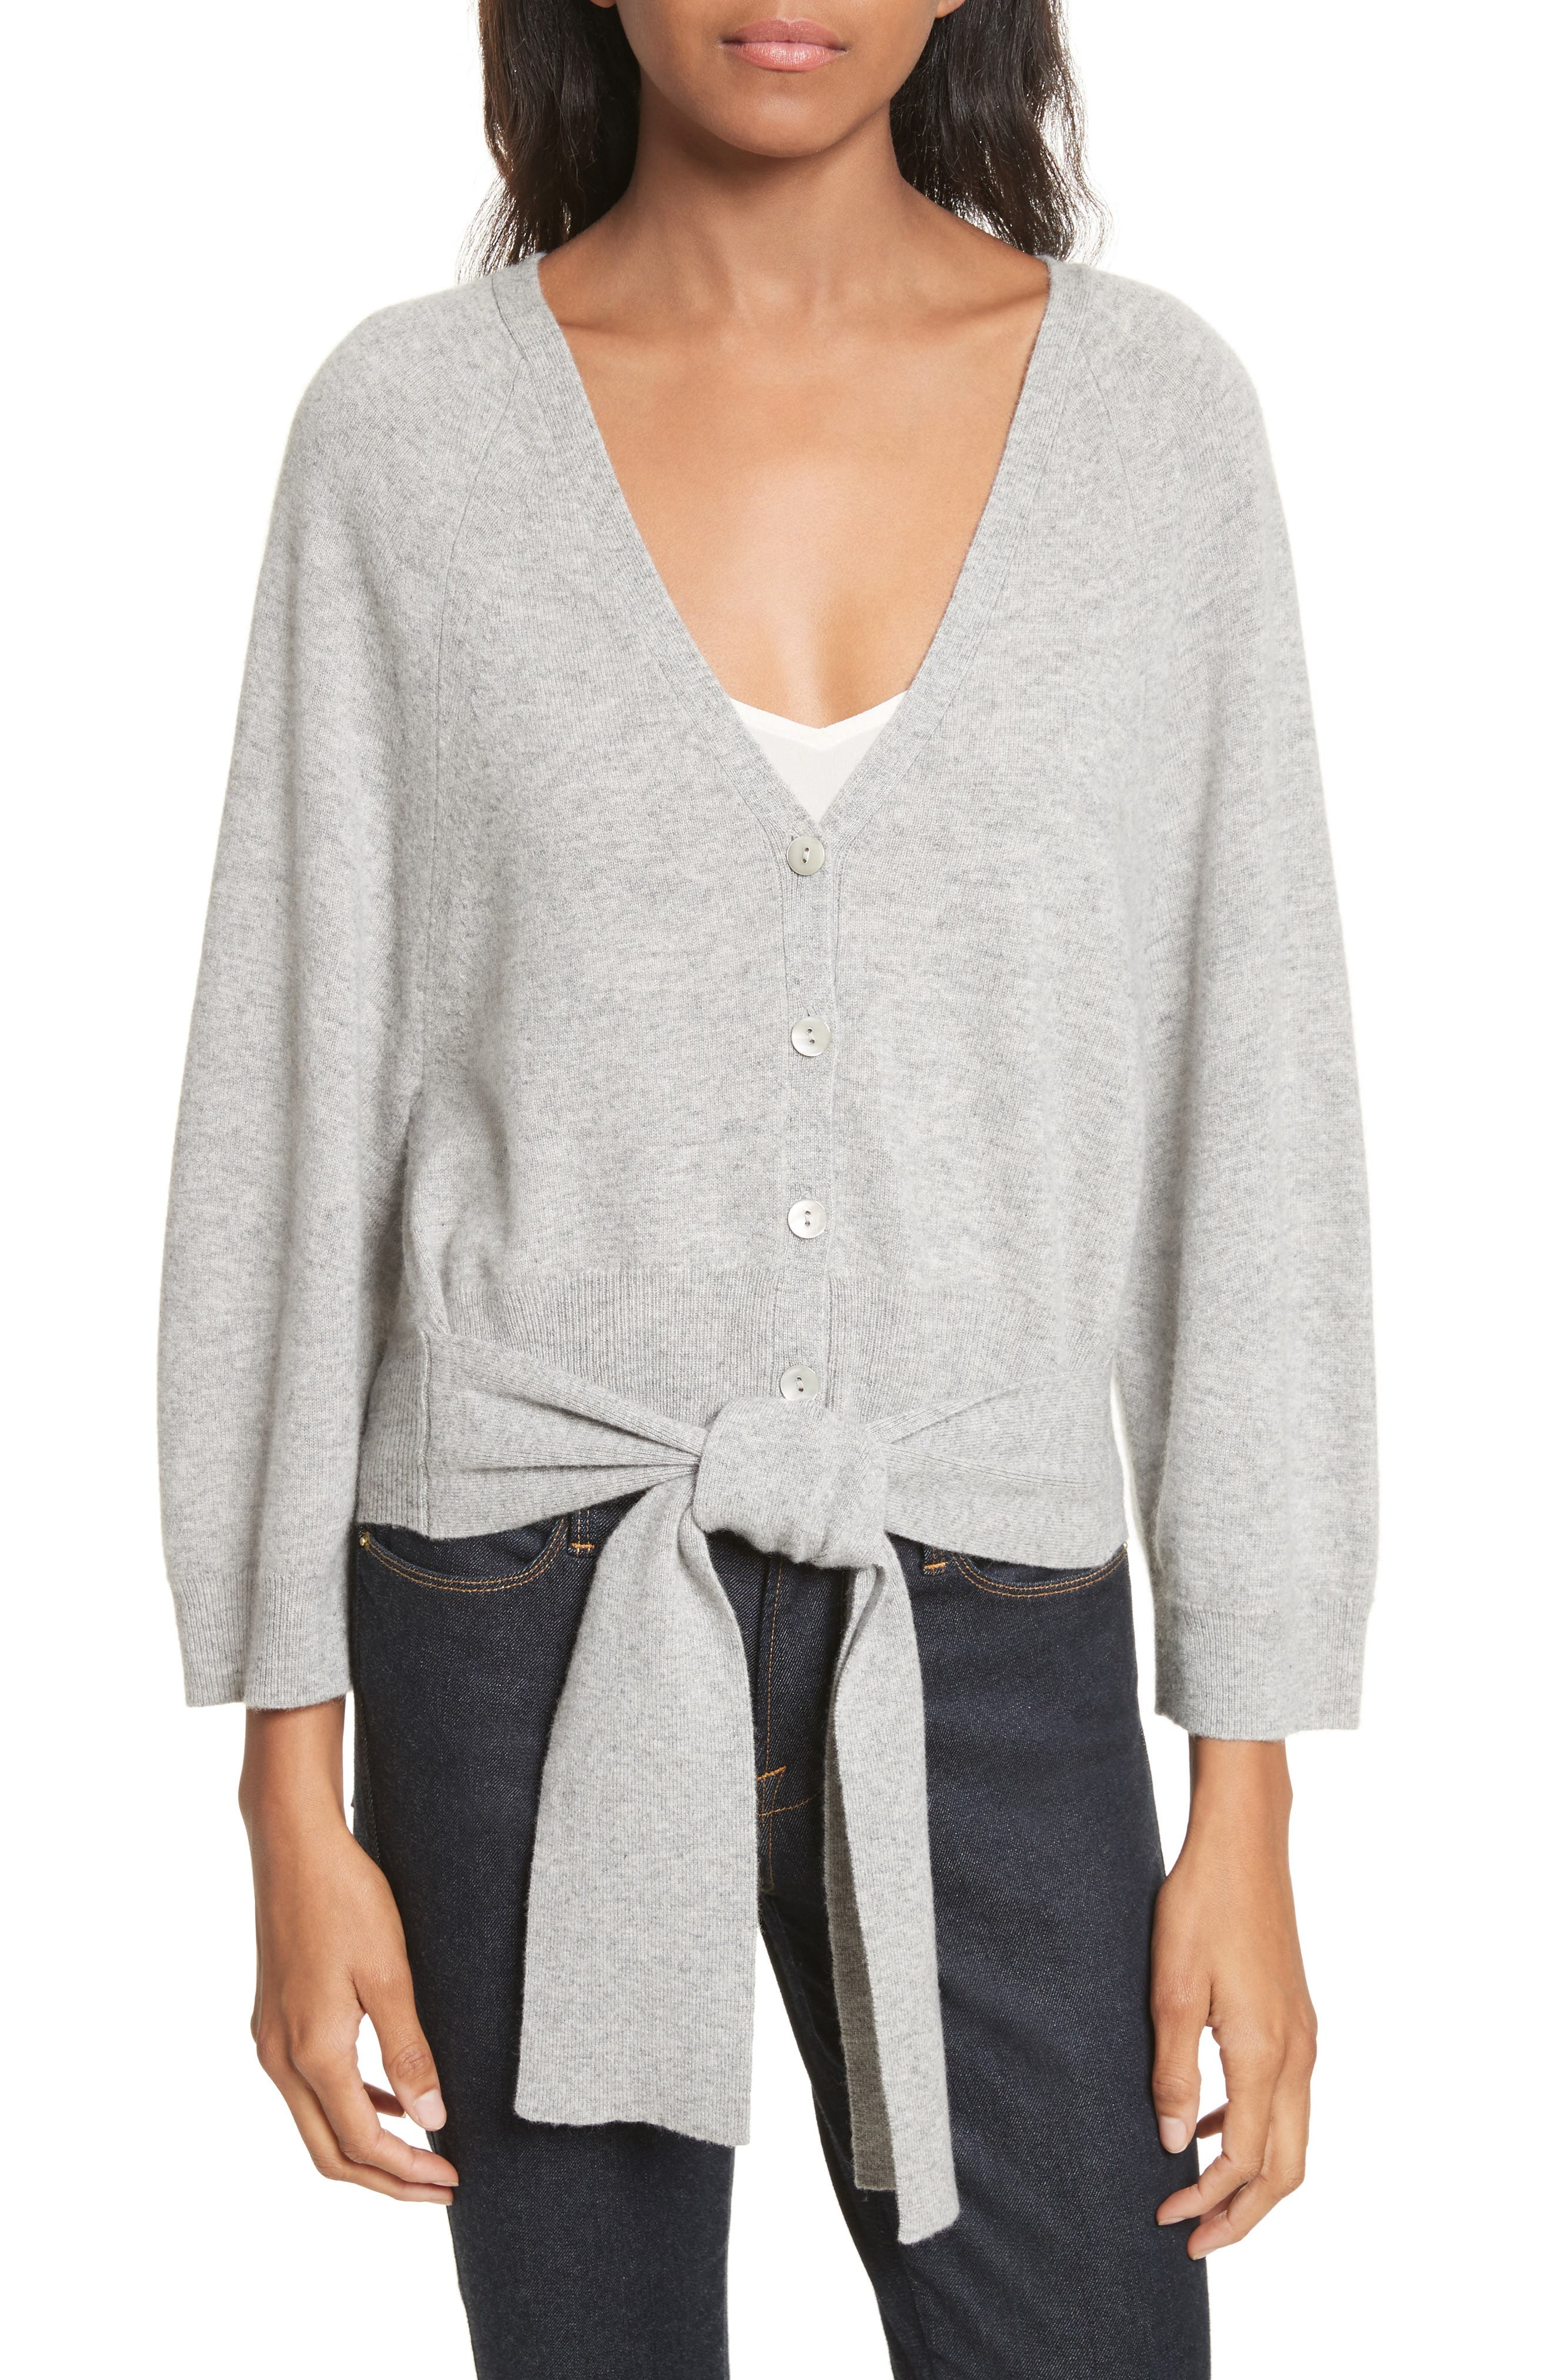 autumn cashmere Wide Sleeve Tie Front Button Cardigan